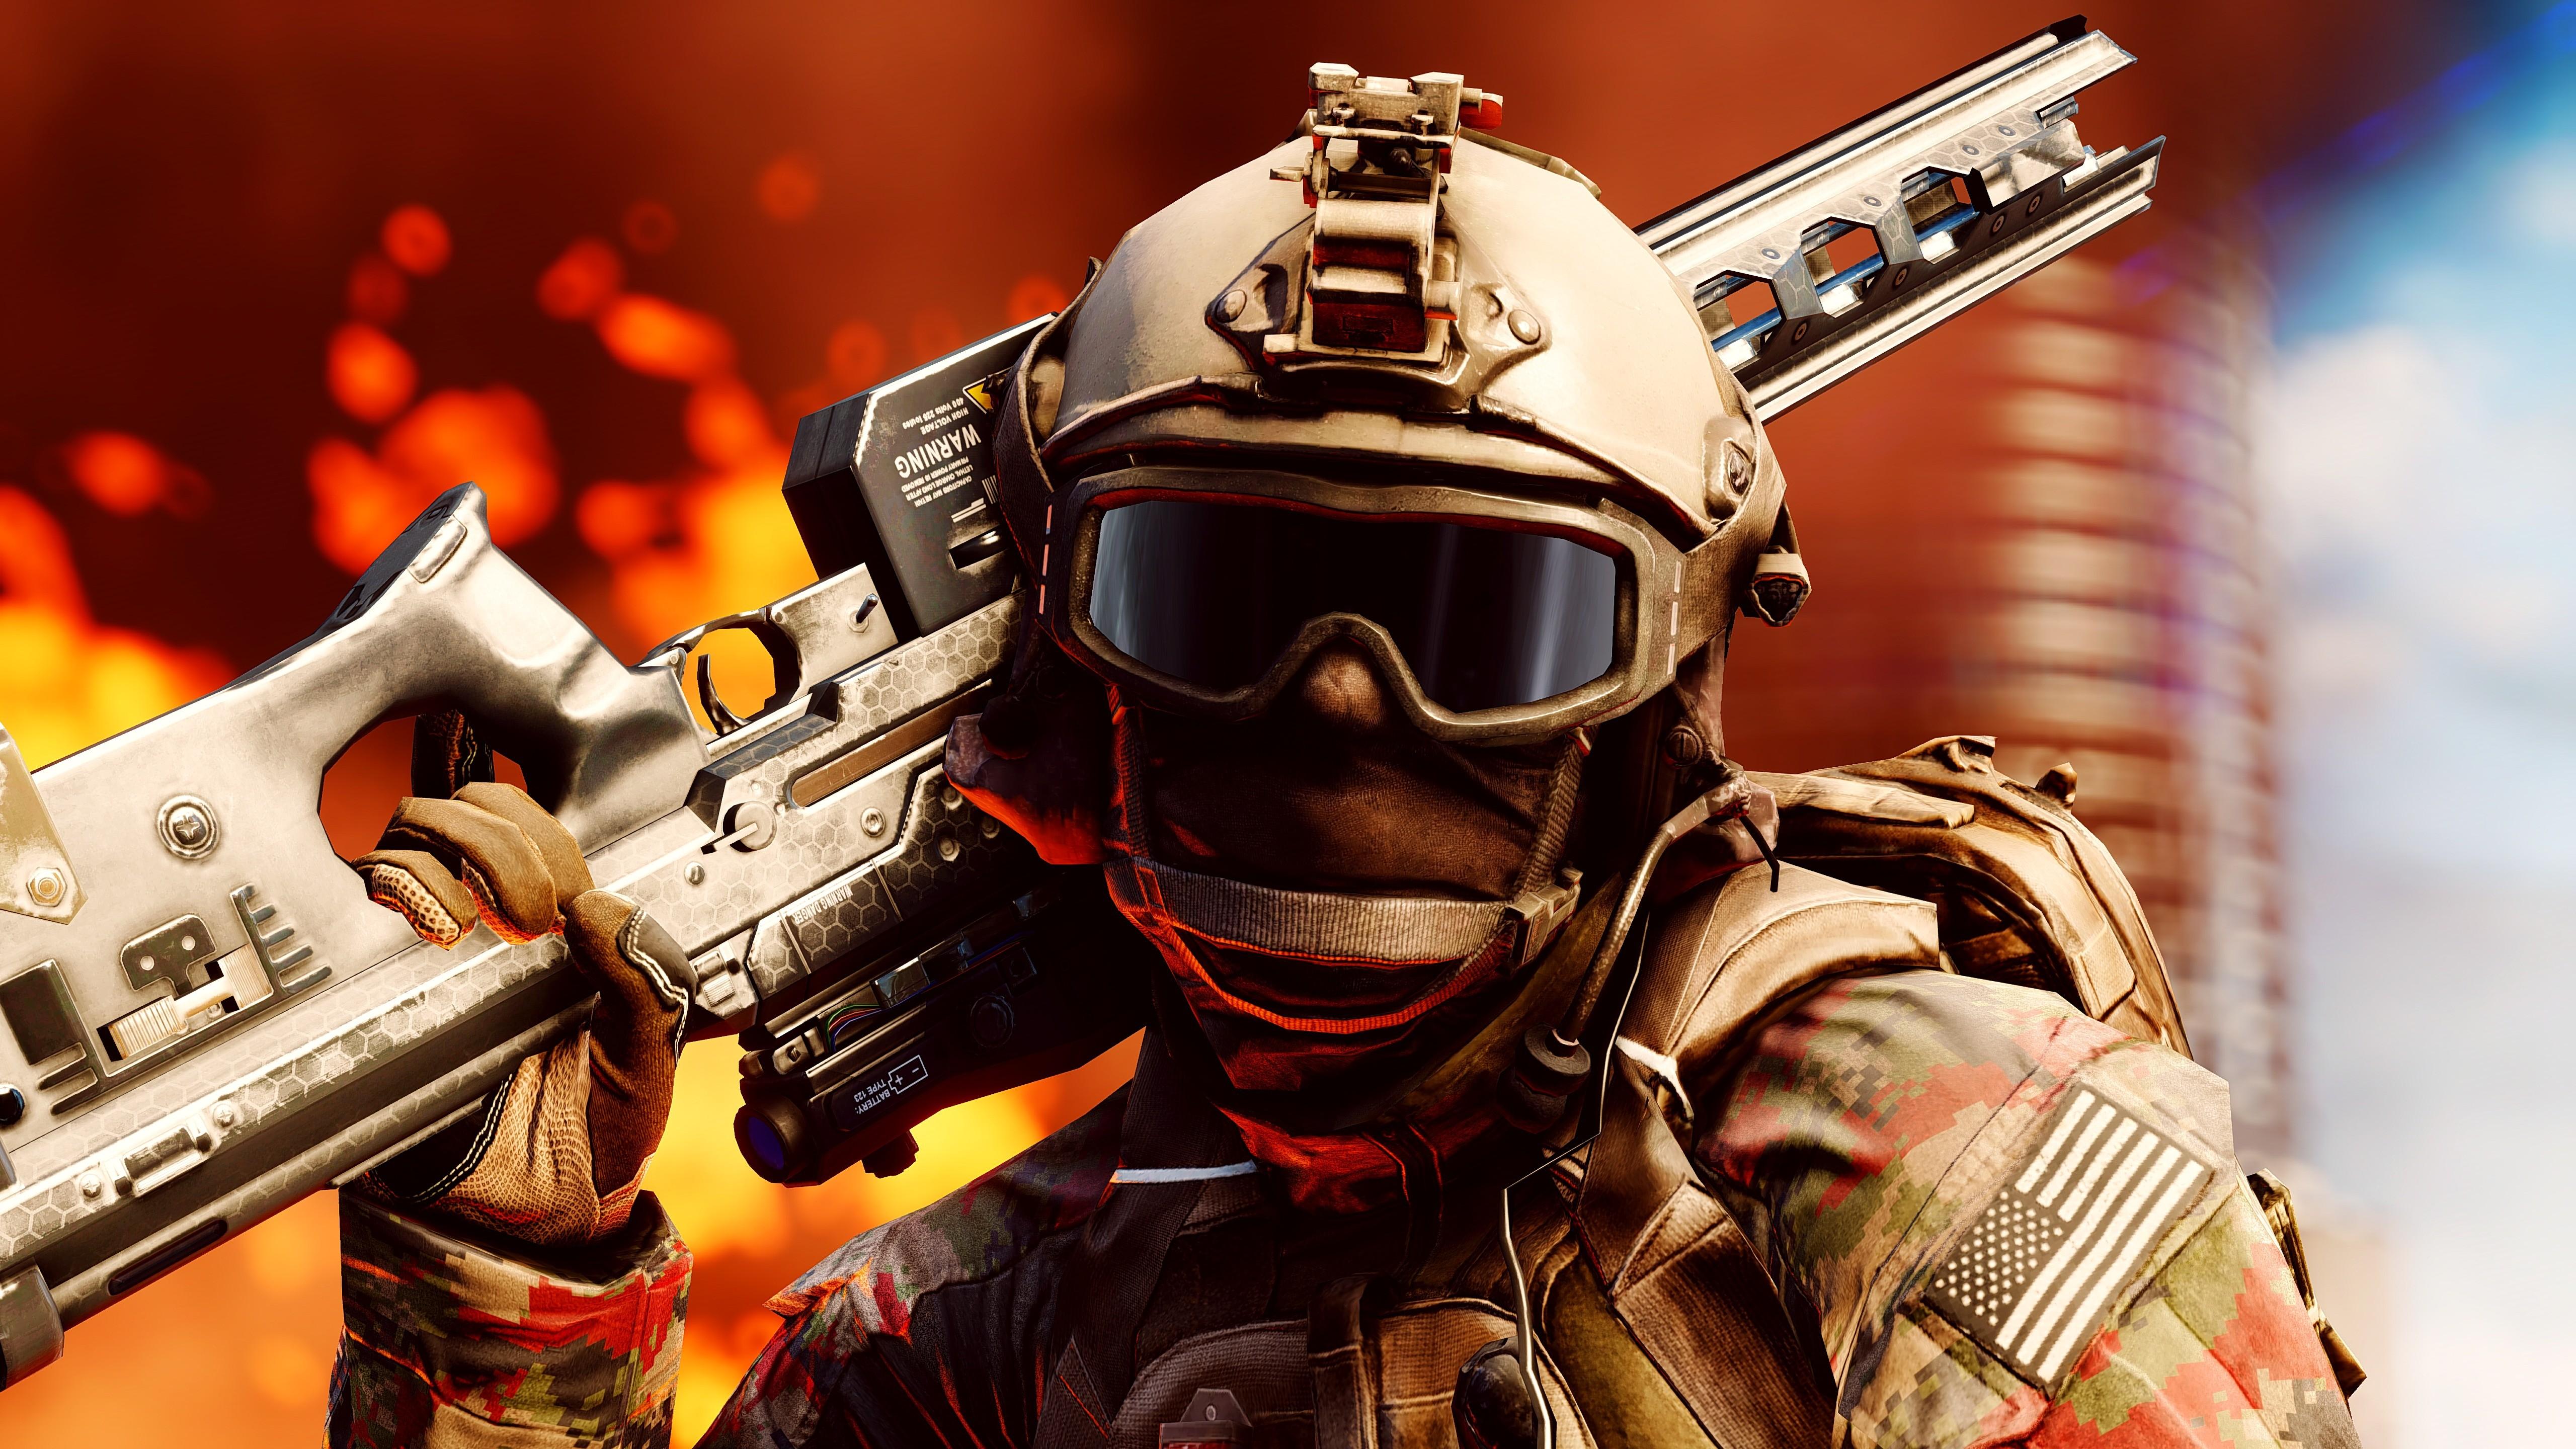 Pubg Sniper Wallpaper: Wallpaper Battlefield 1, Sniper, Best Games Of 2016